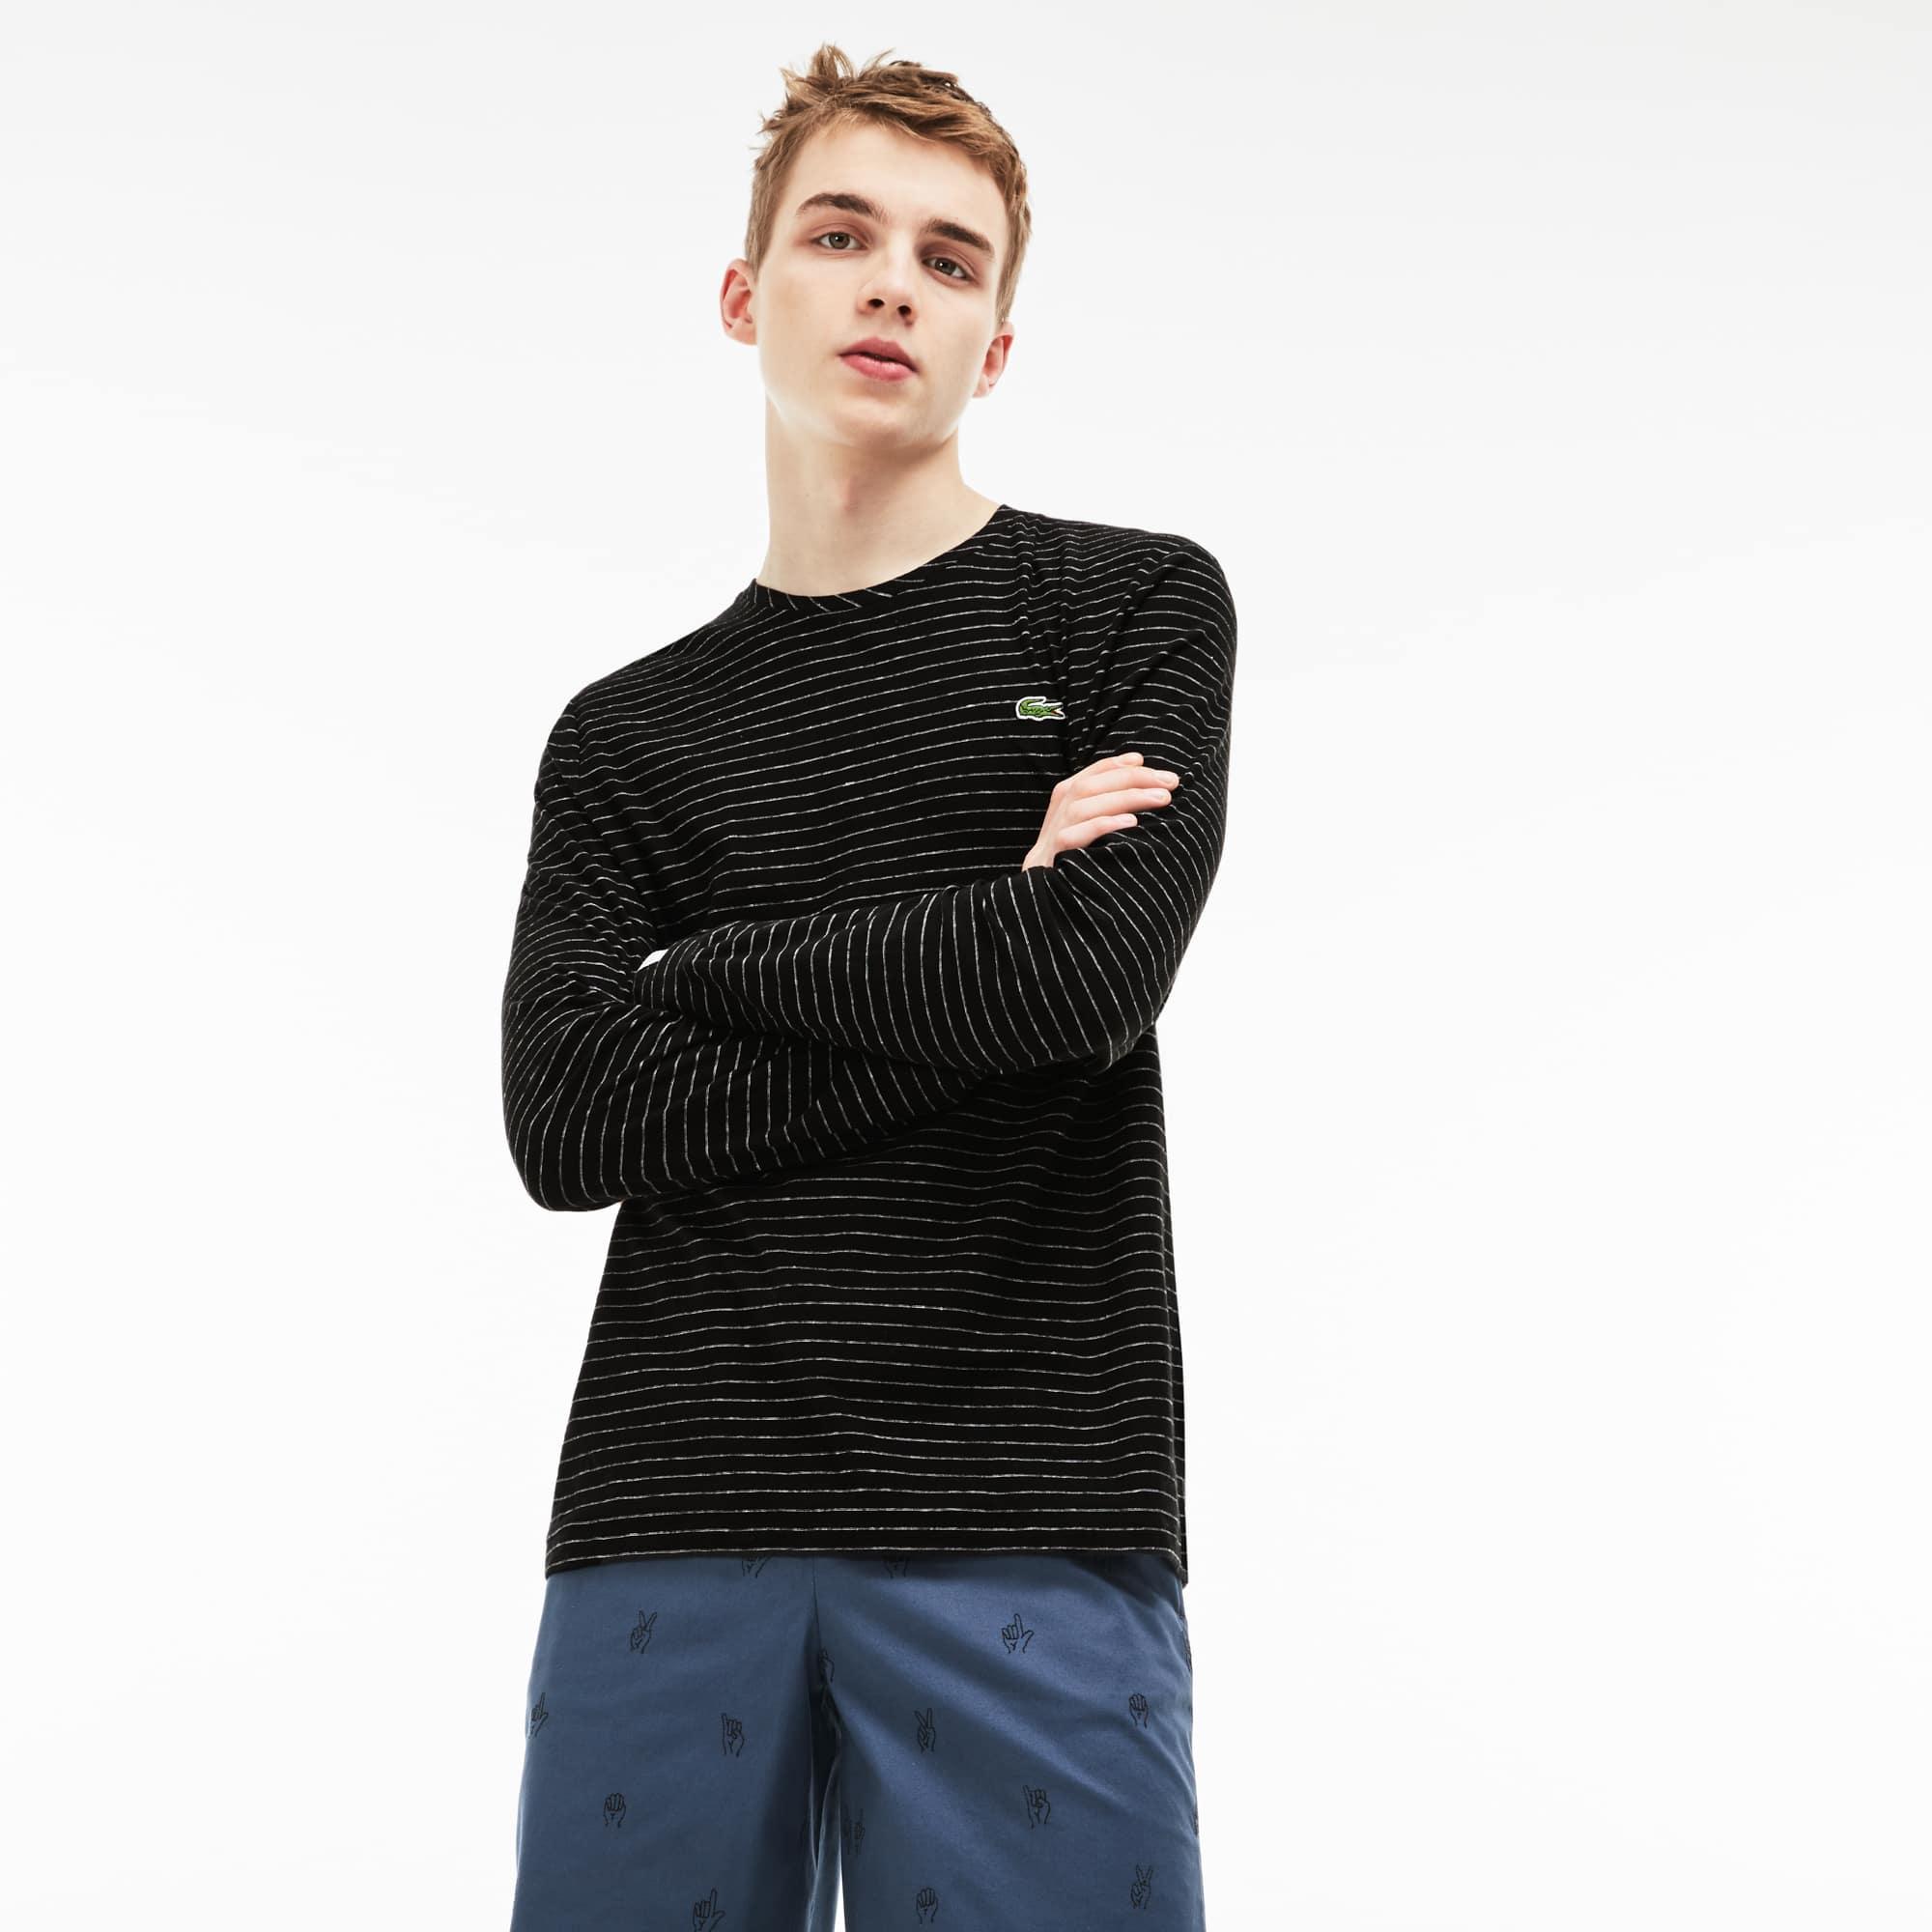 Men's Lacoste LIVE Striped Cotton And Linen Jersey T-shirt